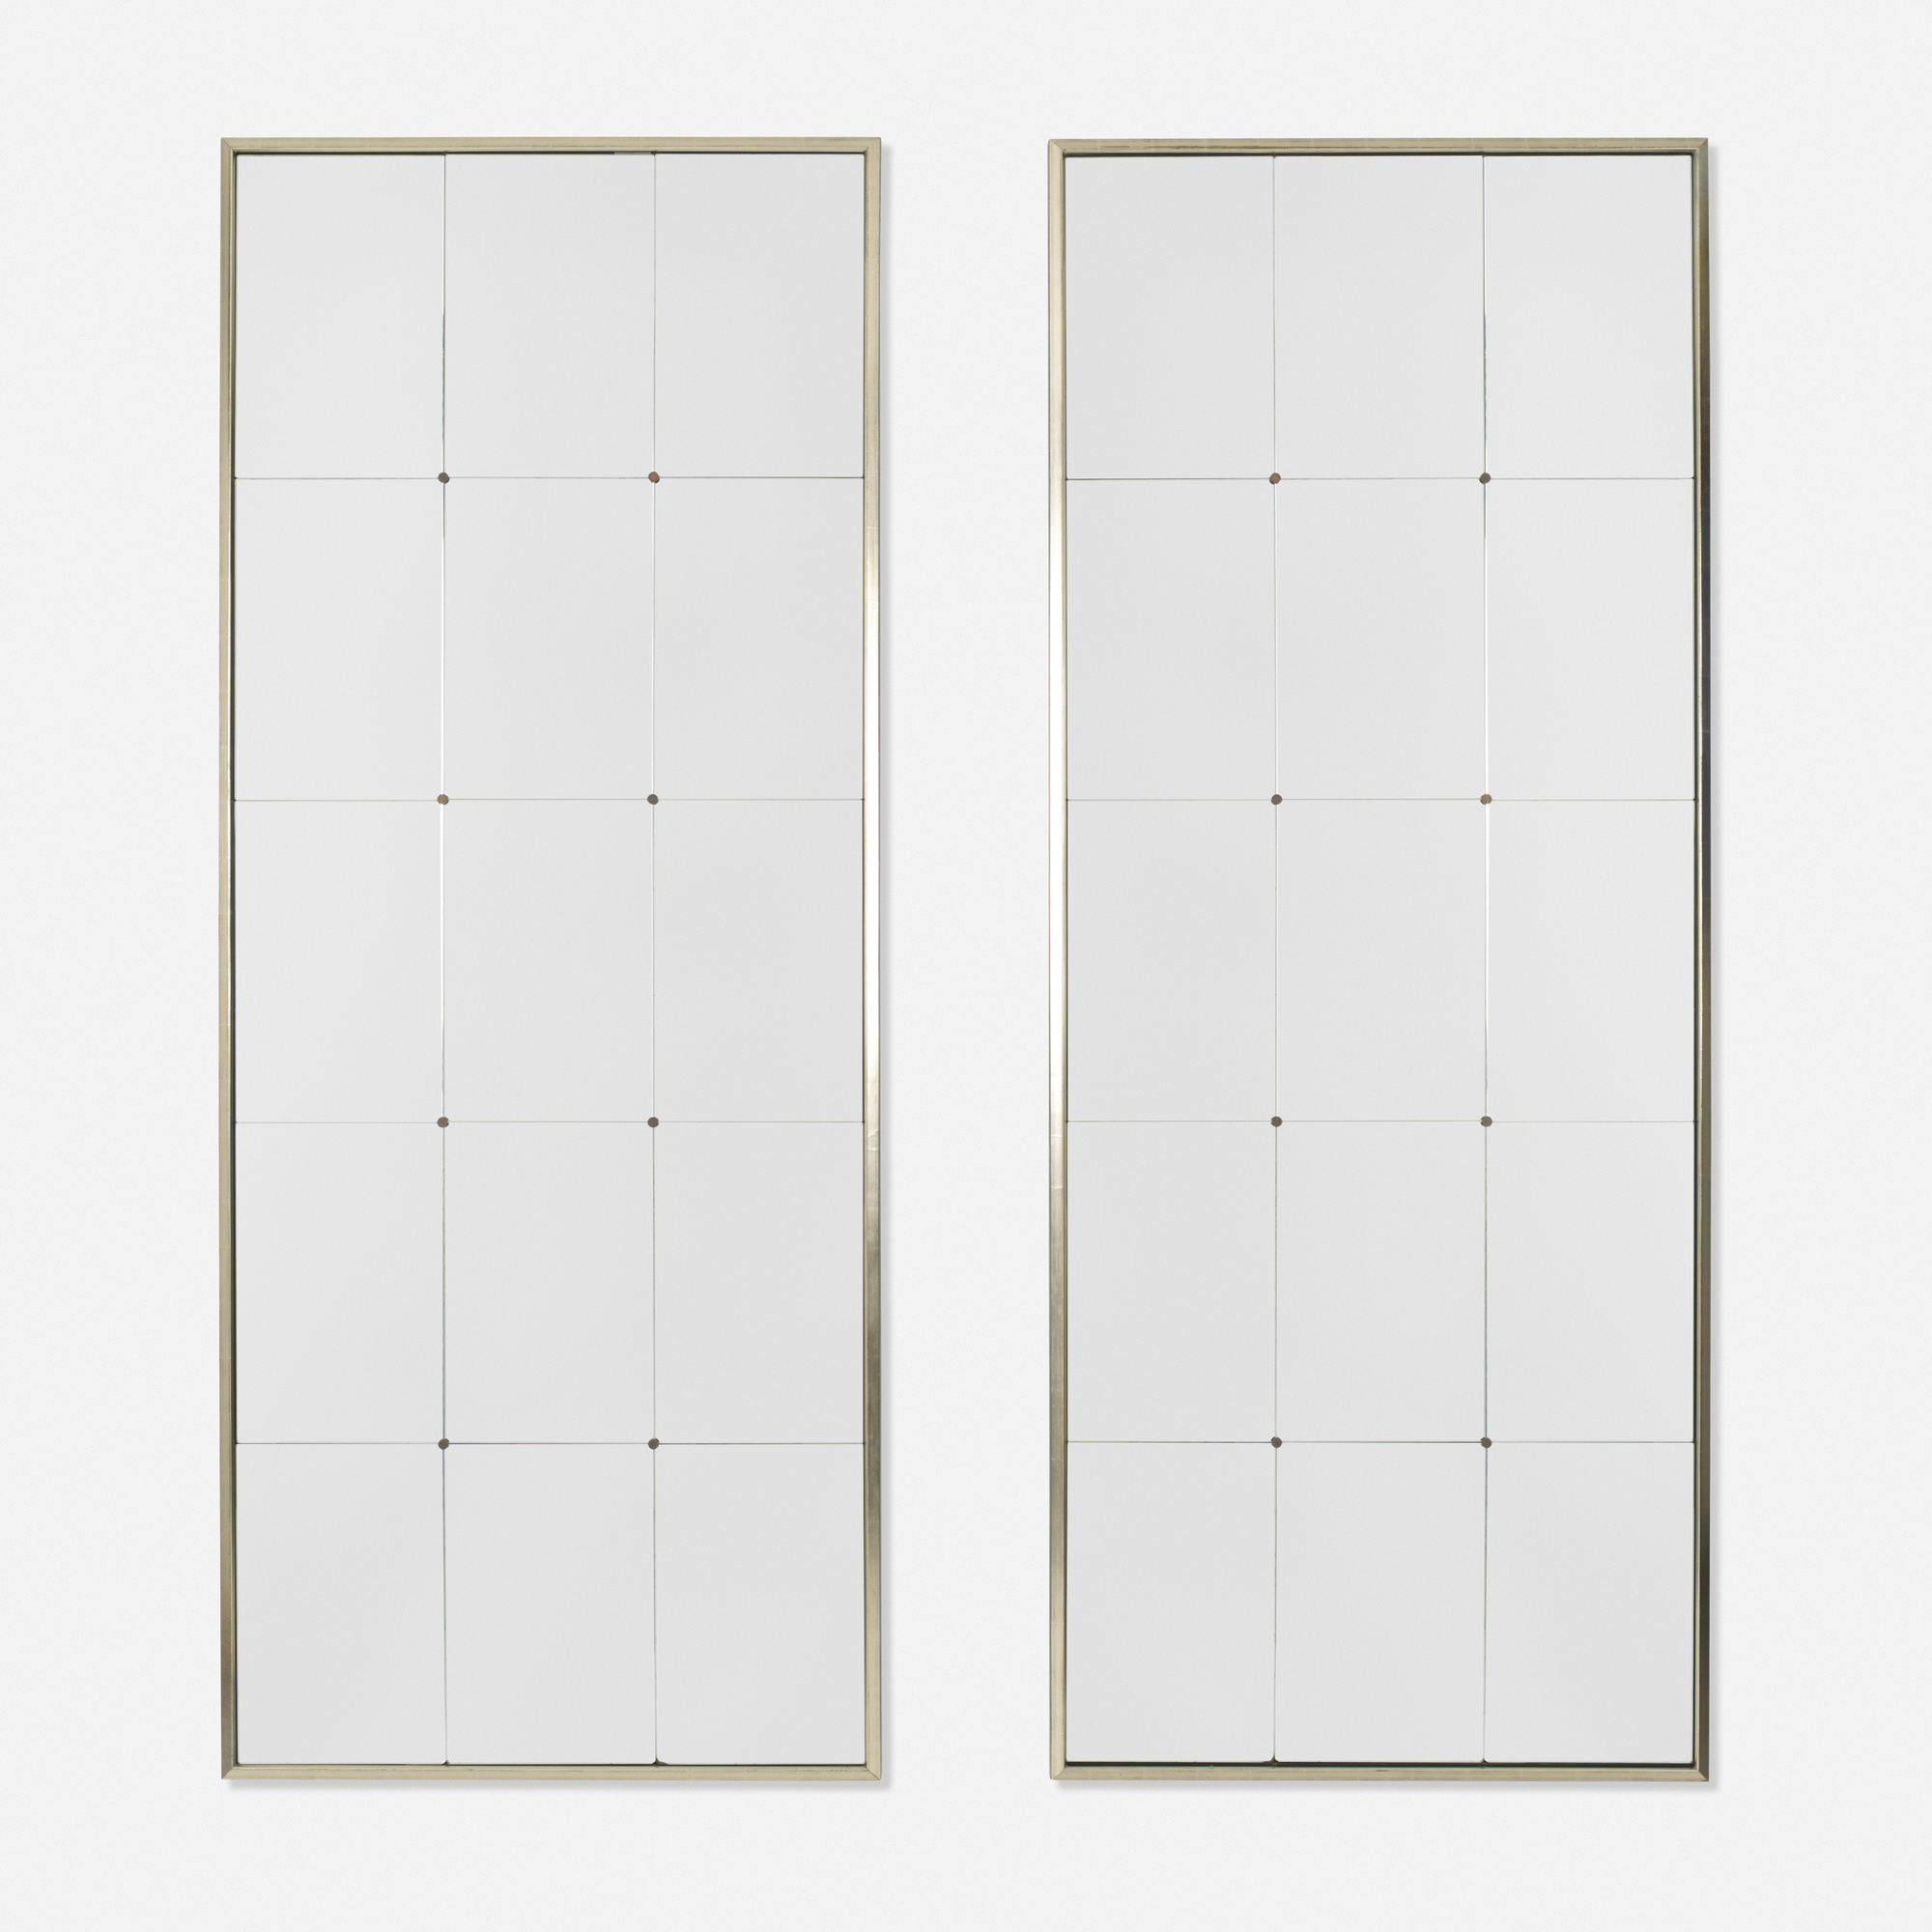 168: George Larson / mirrors, pair (1 of 1)